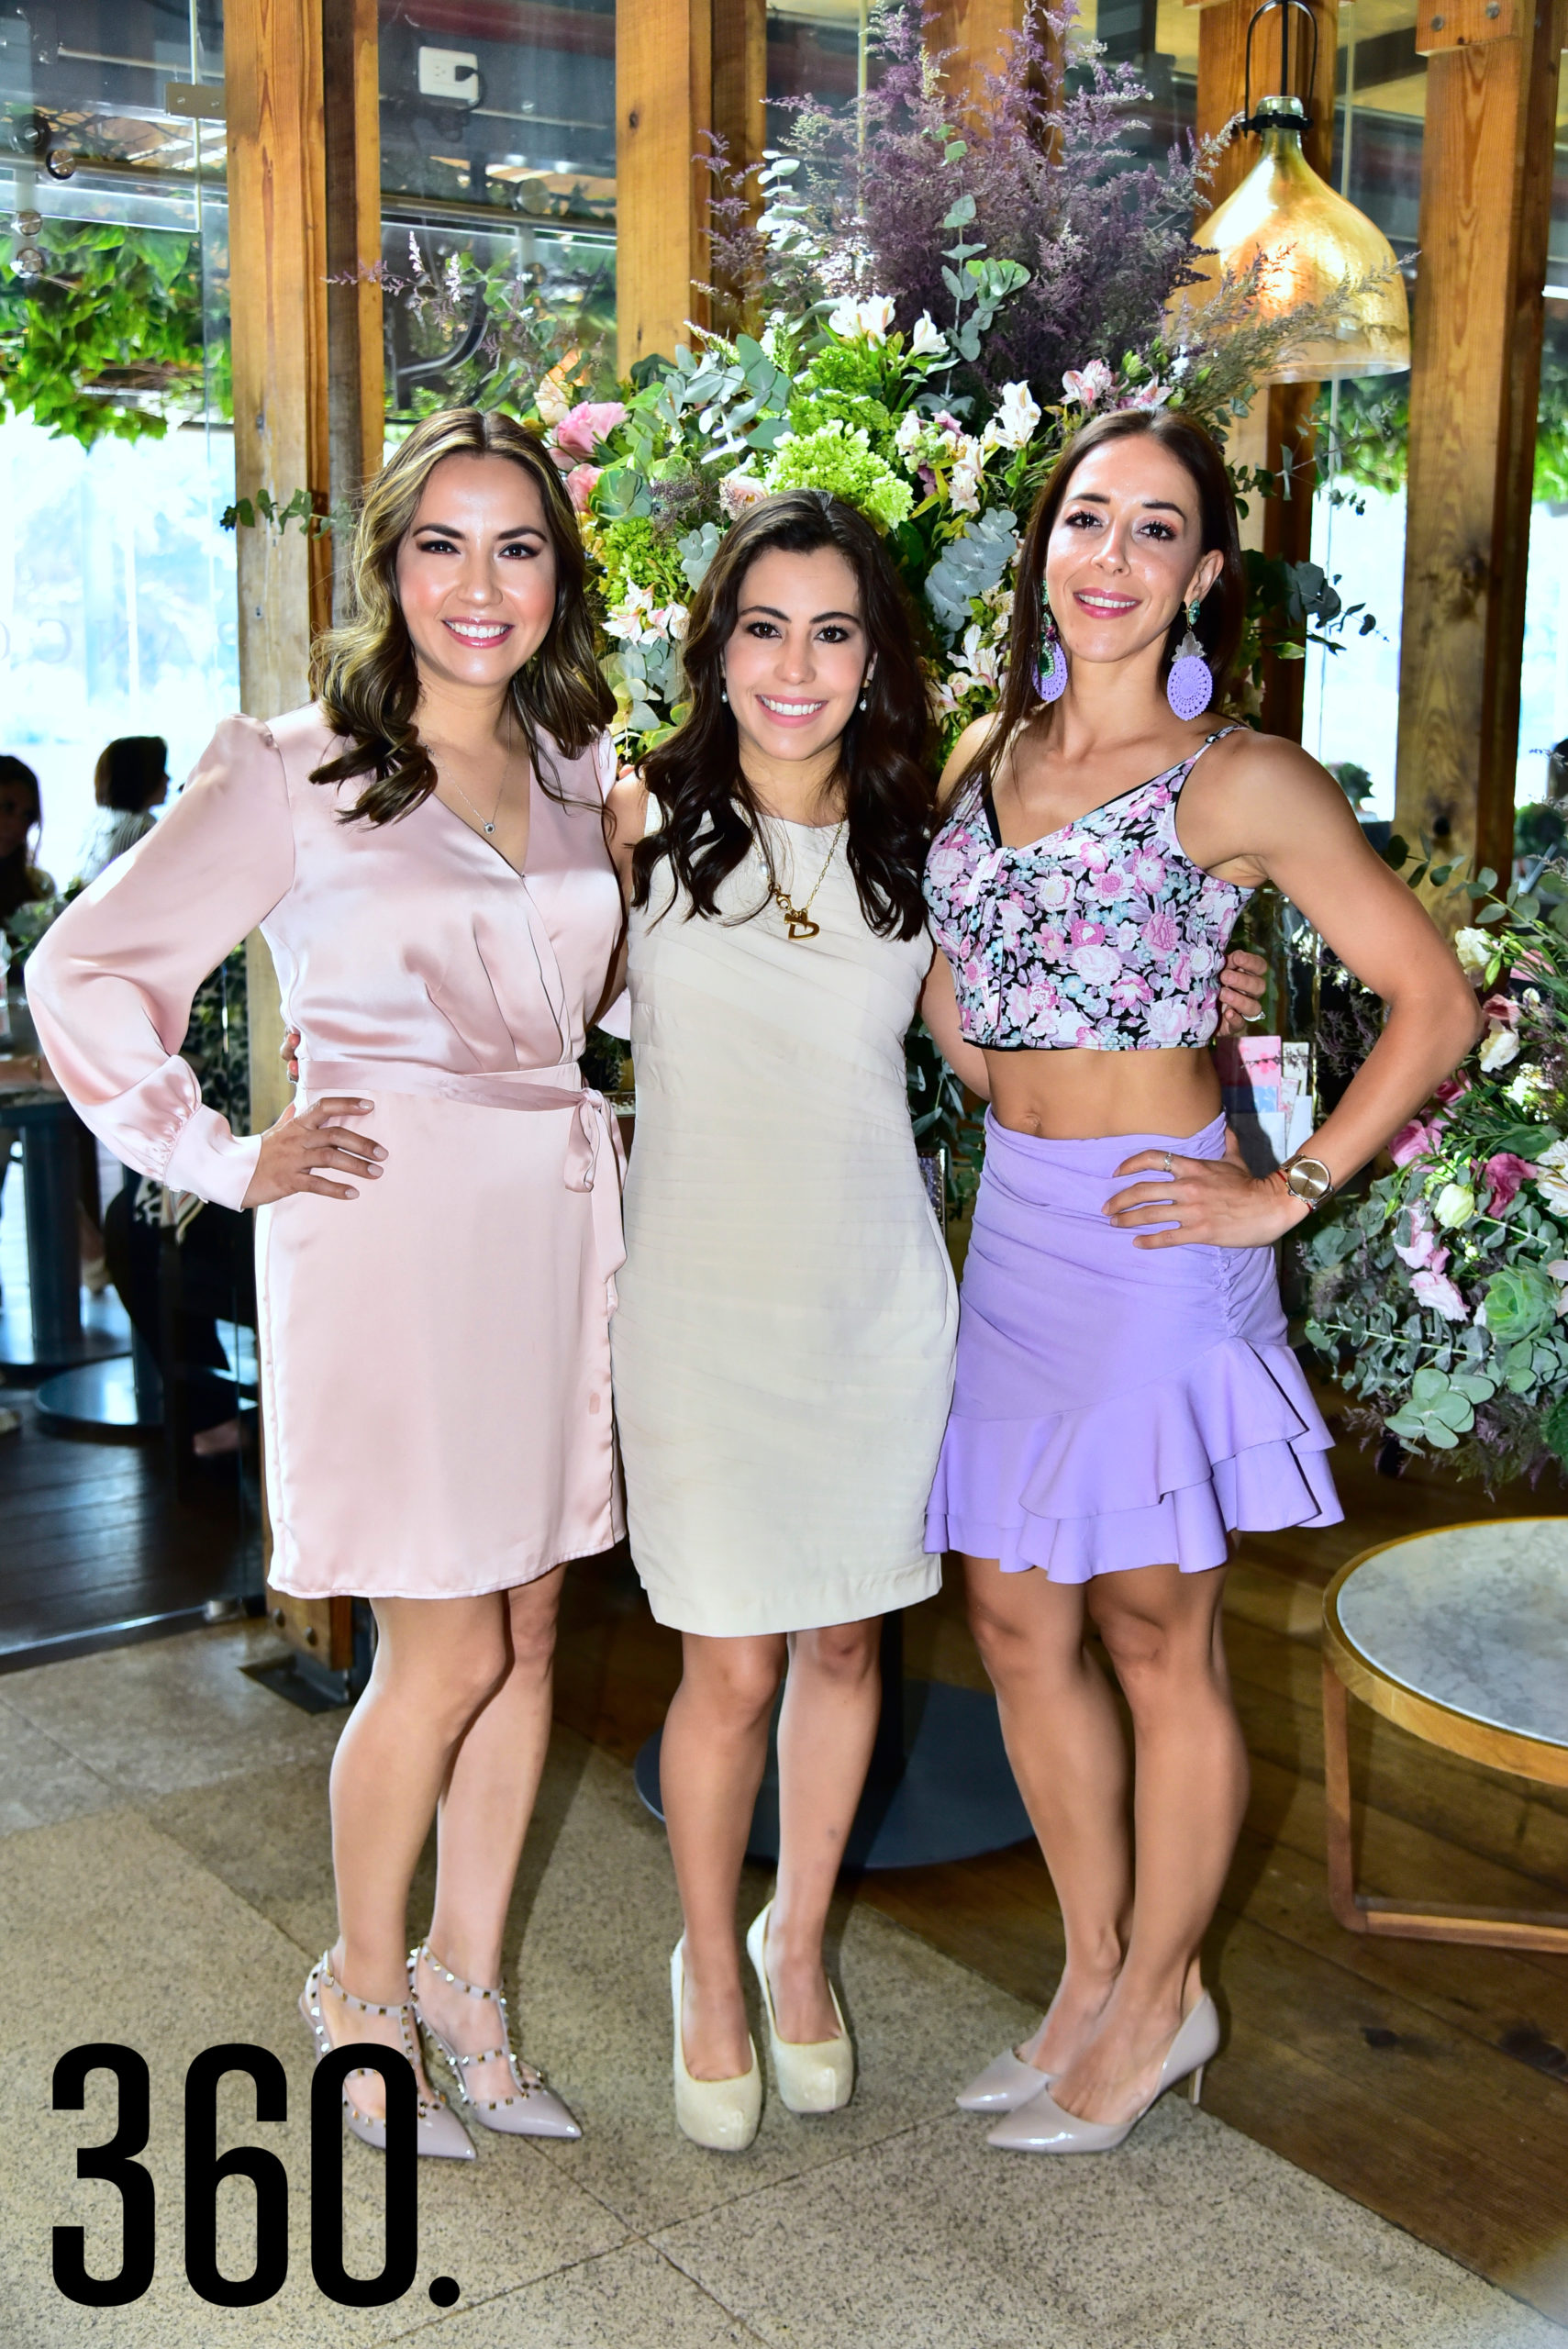 Cynthia Villanueva, Yesica Rivera y Erika Silveira.